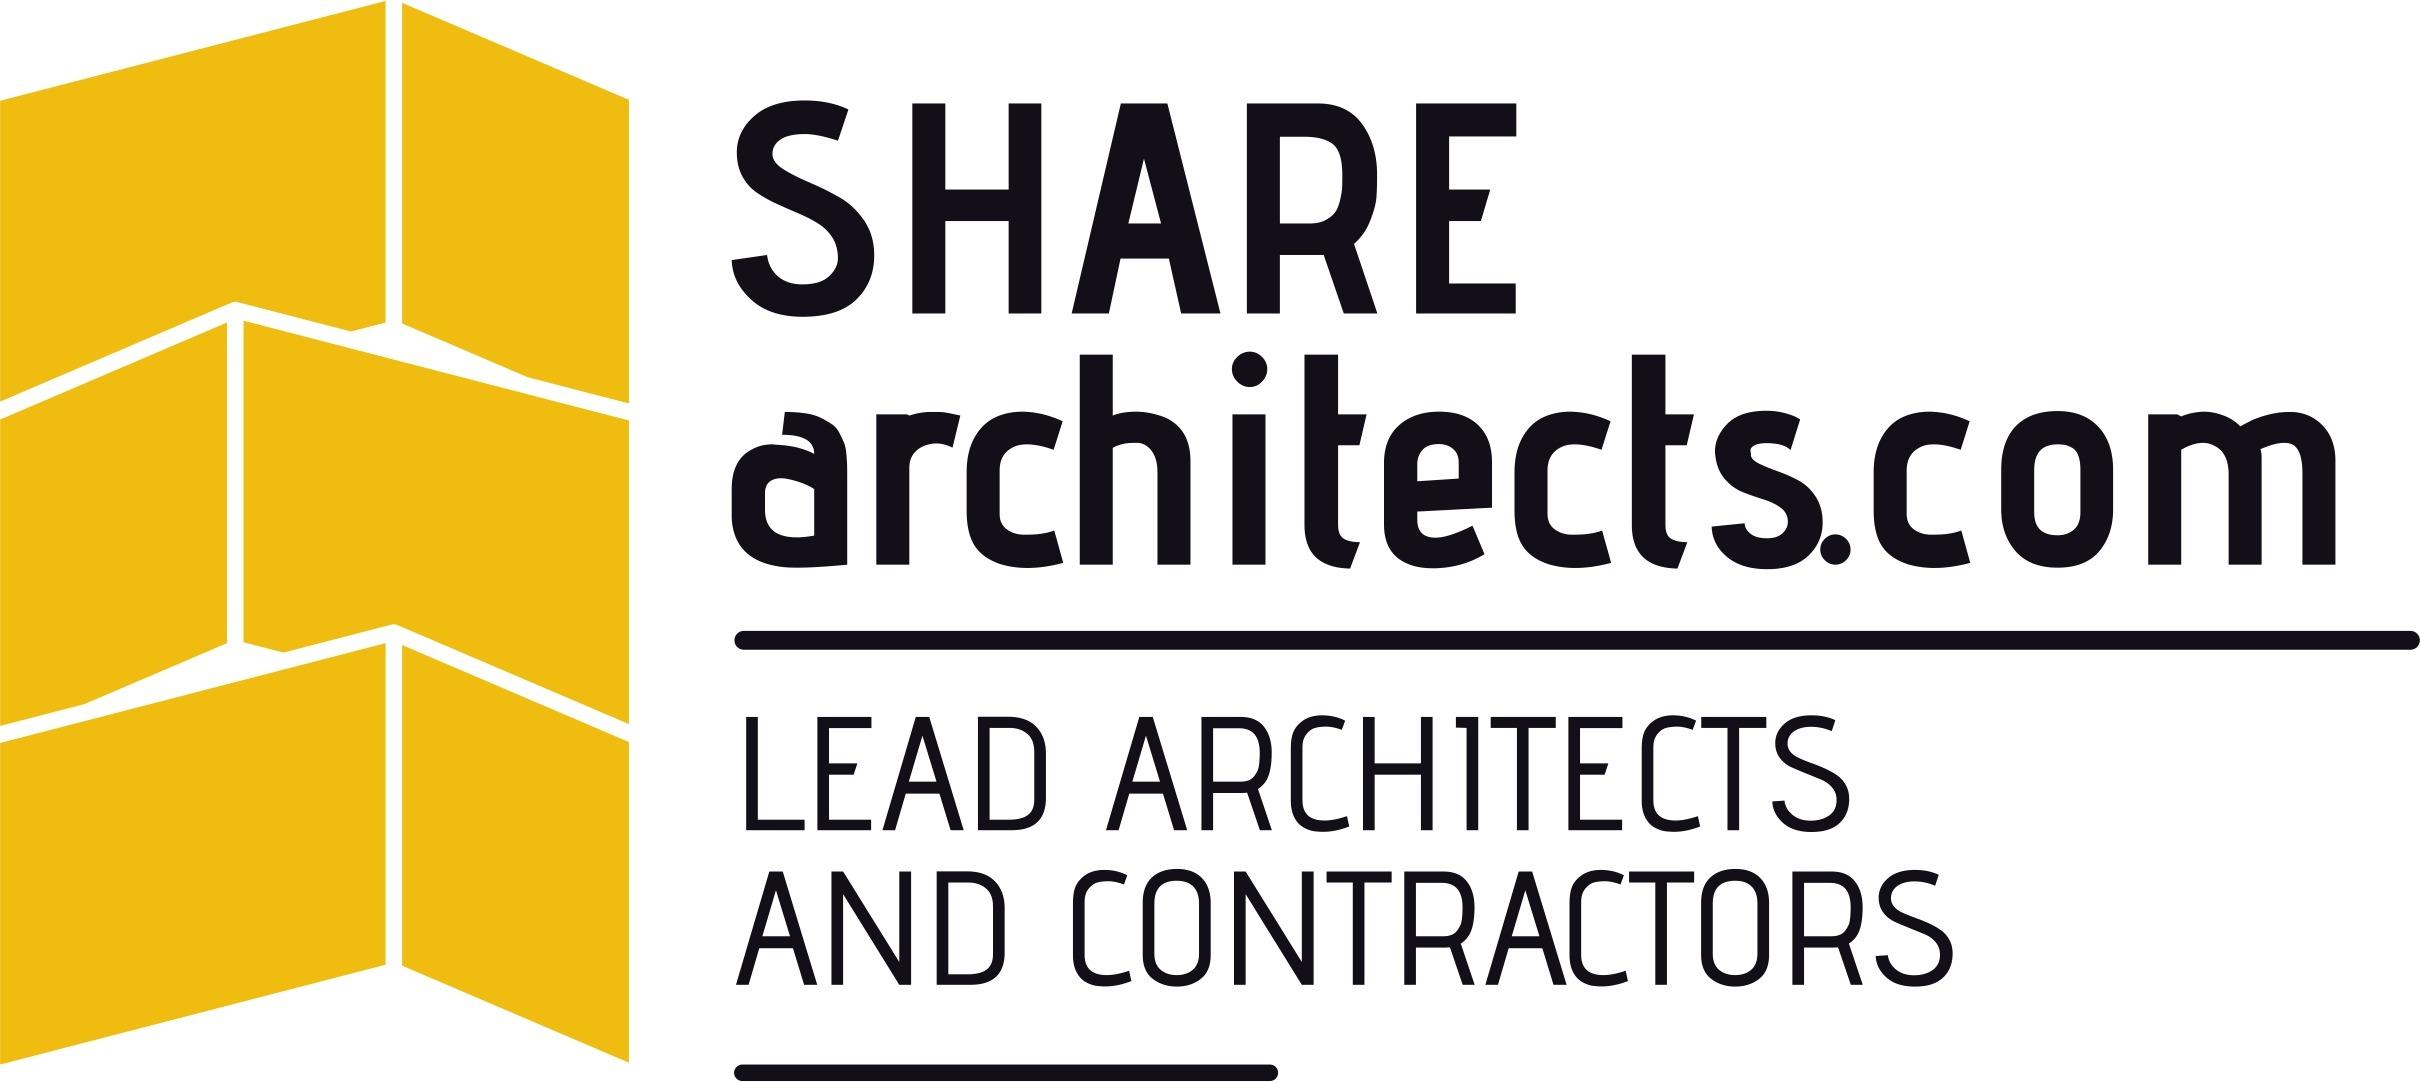 https://share-architects.com/